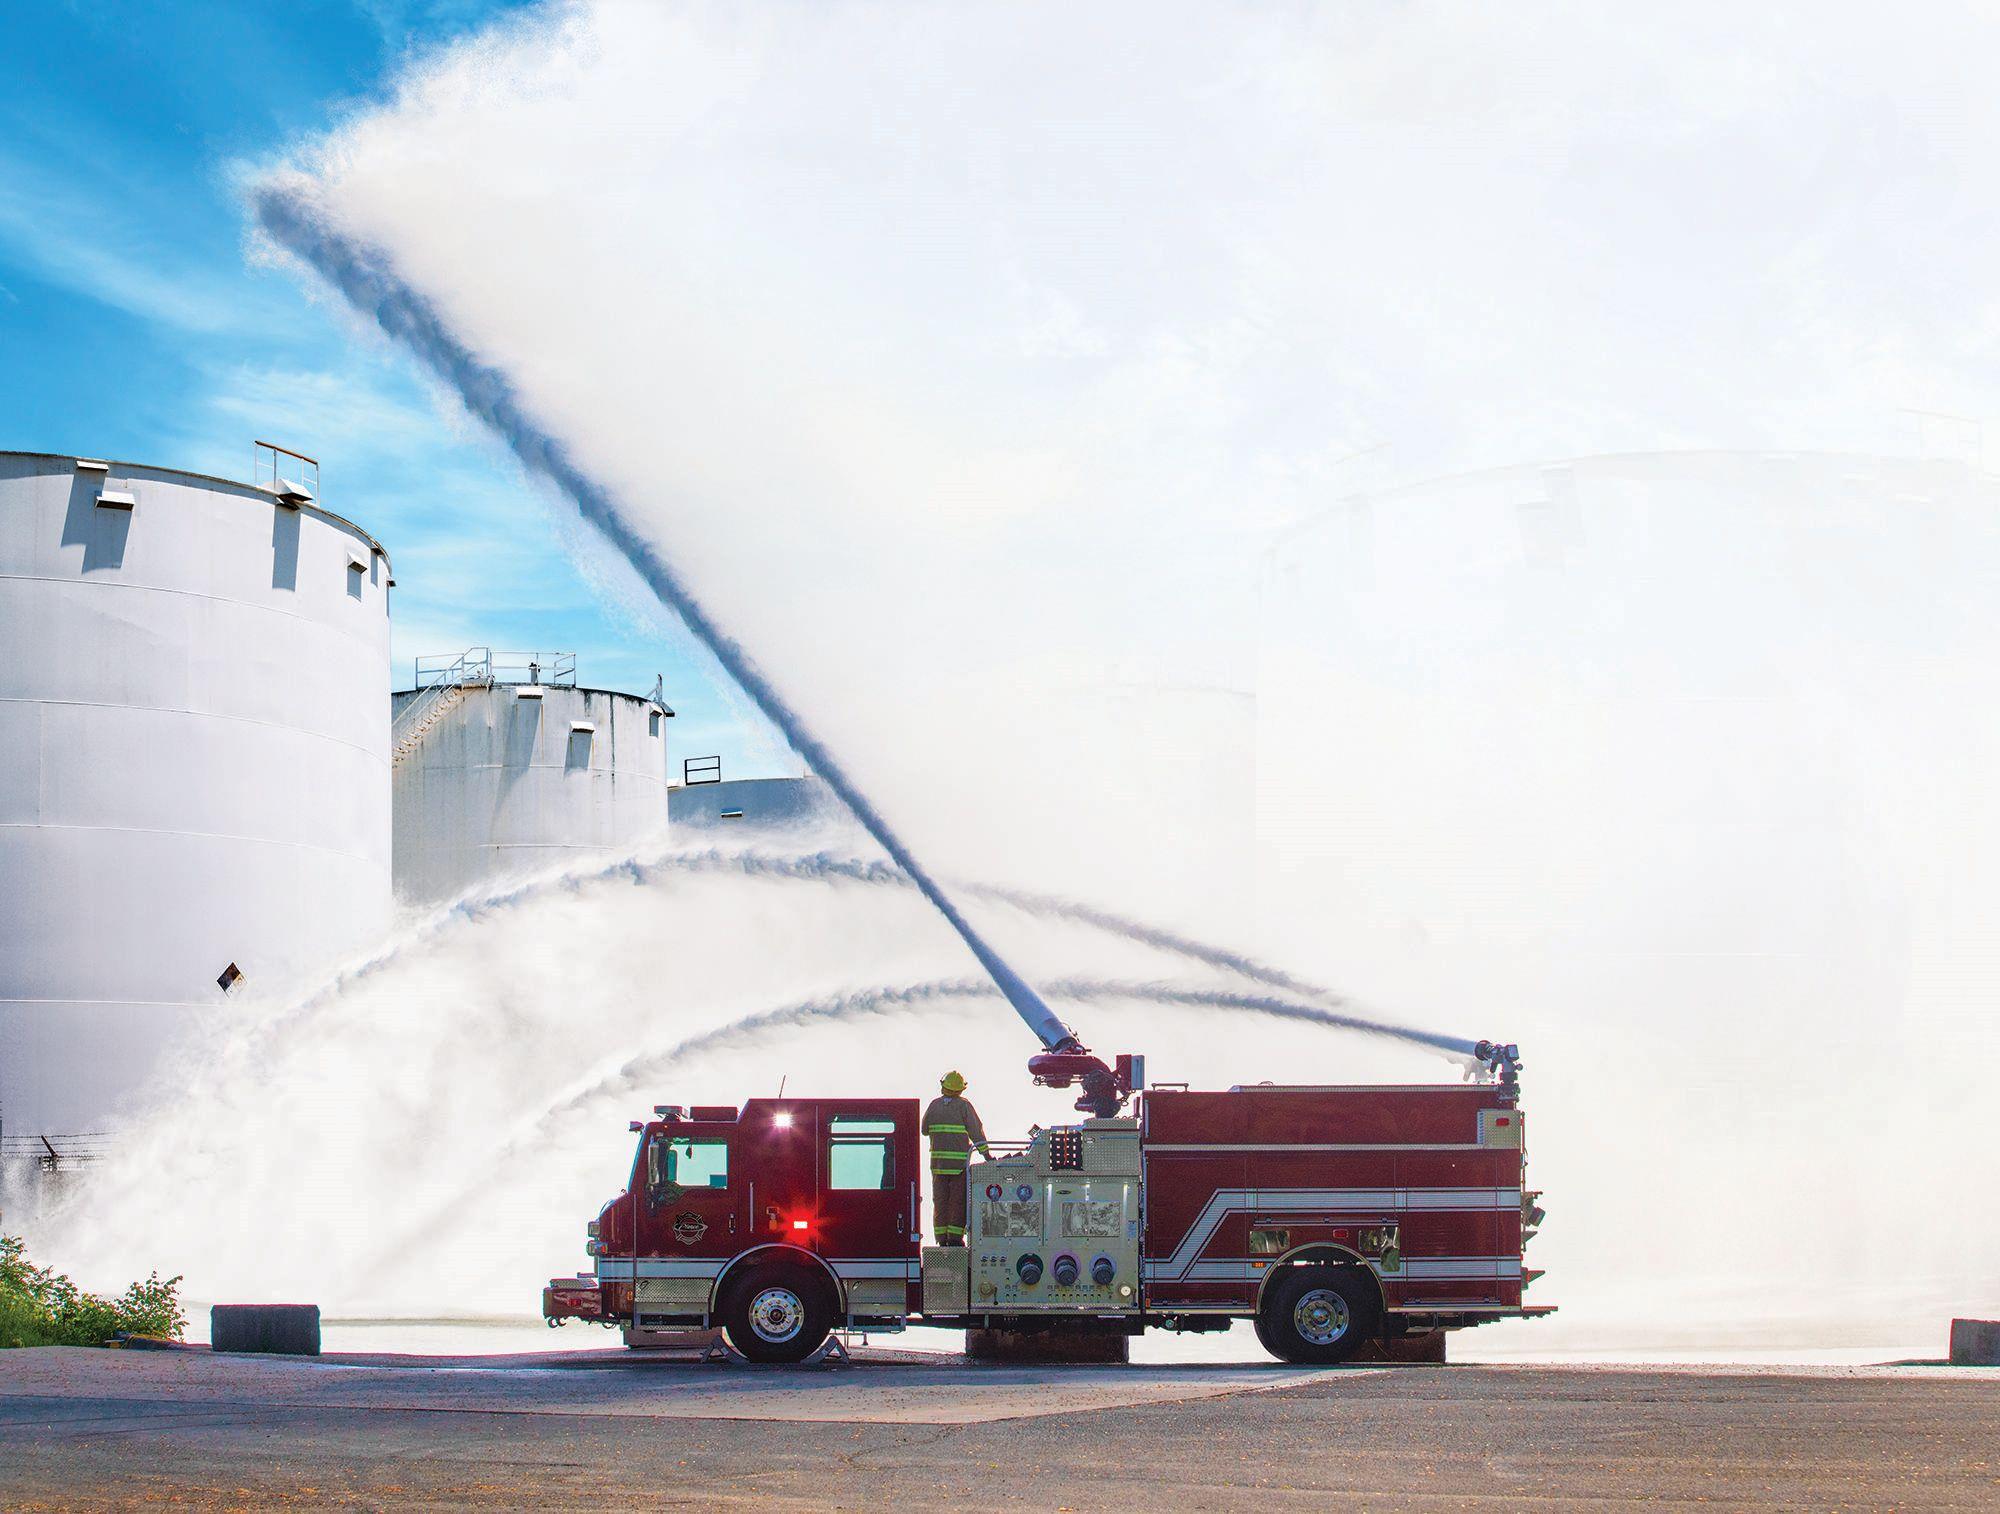 Pierce Introduces High Flow Fire Apparatus